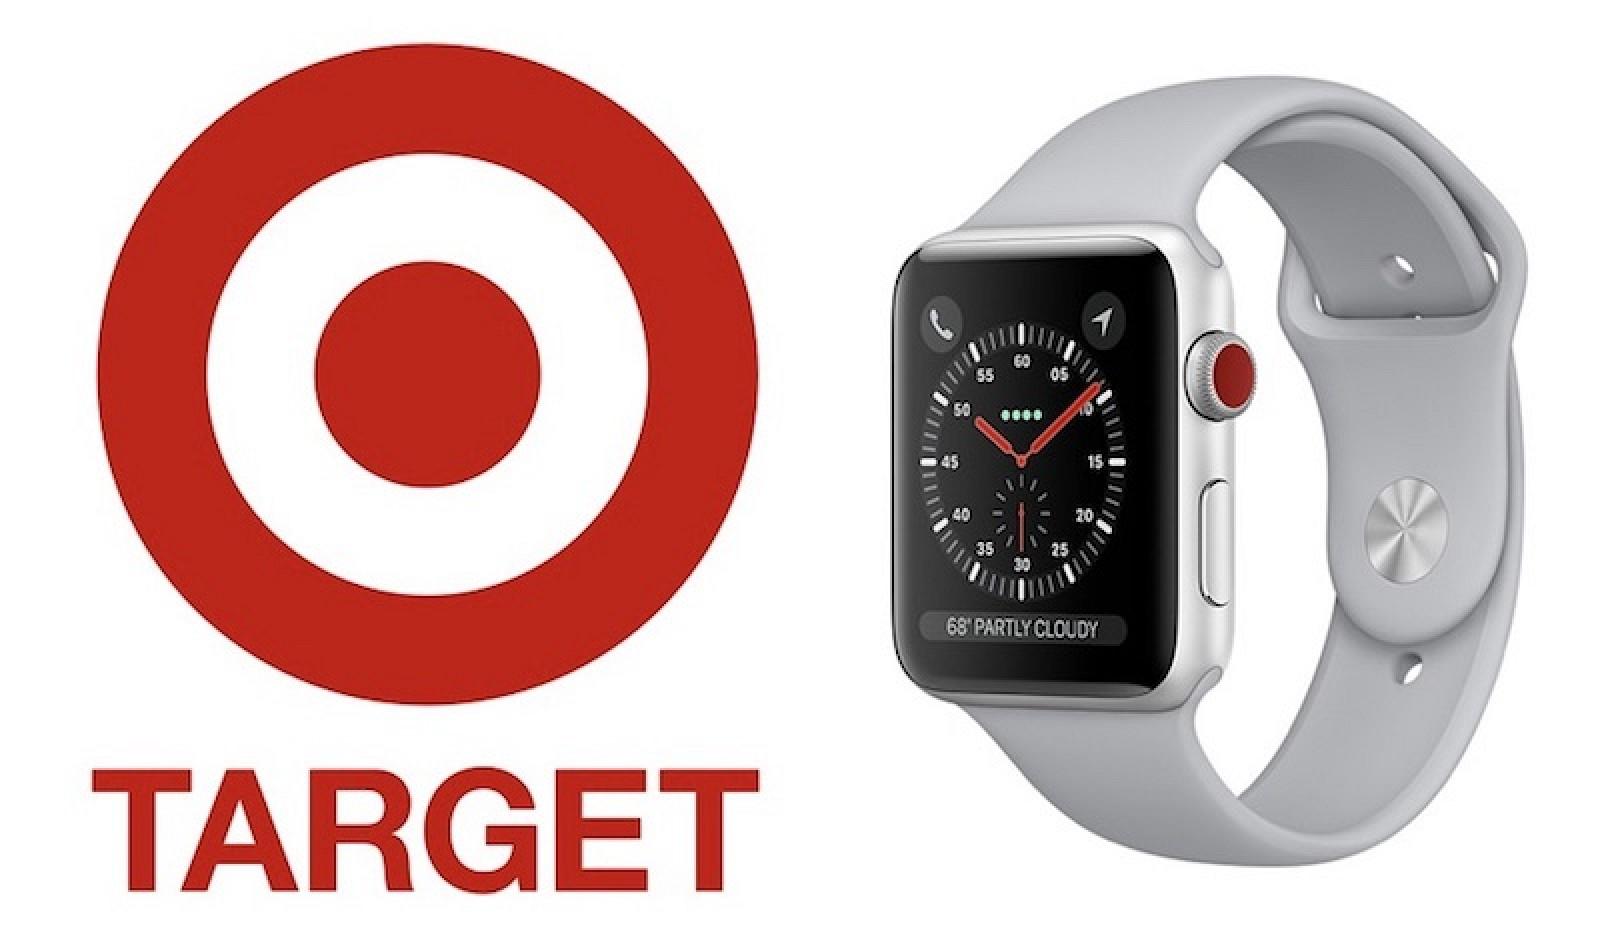 timeless design 73be4 8d8ff Target Begins Notifying Some Apple Watch Series 3 Pre-Order ...